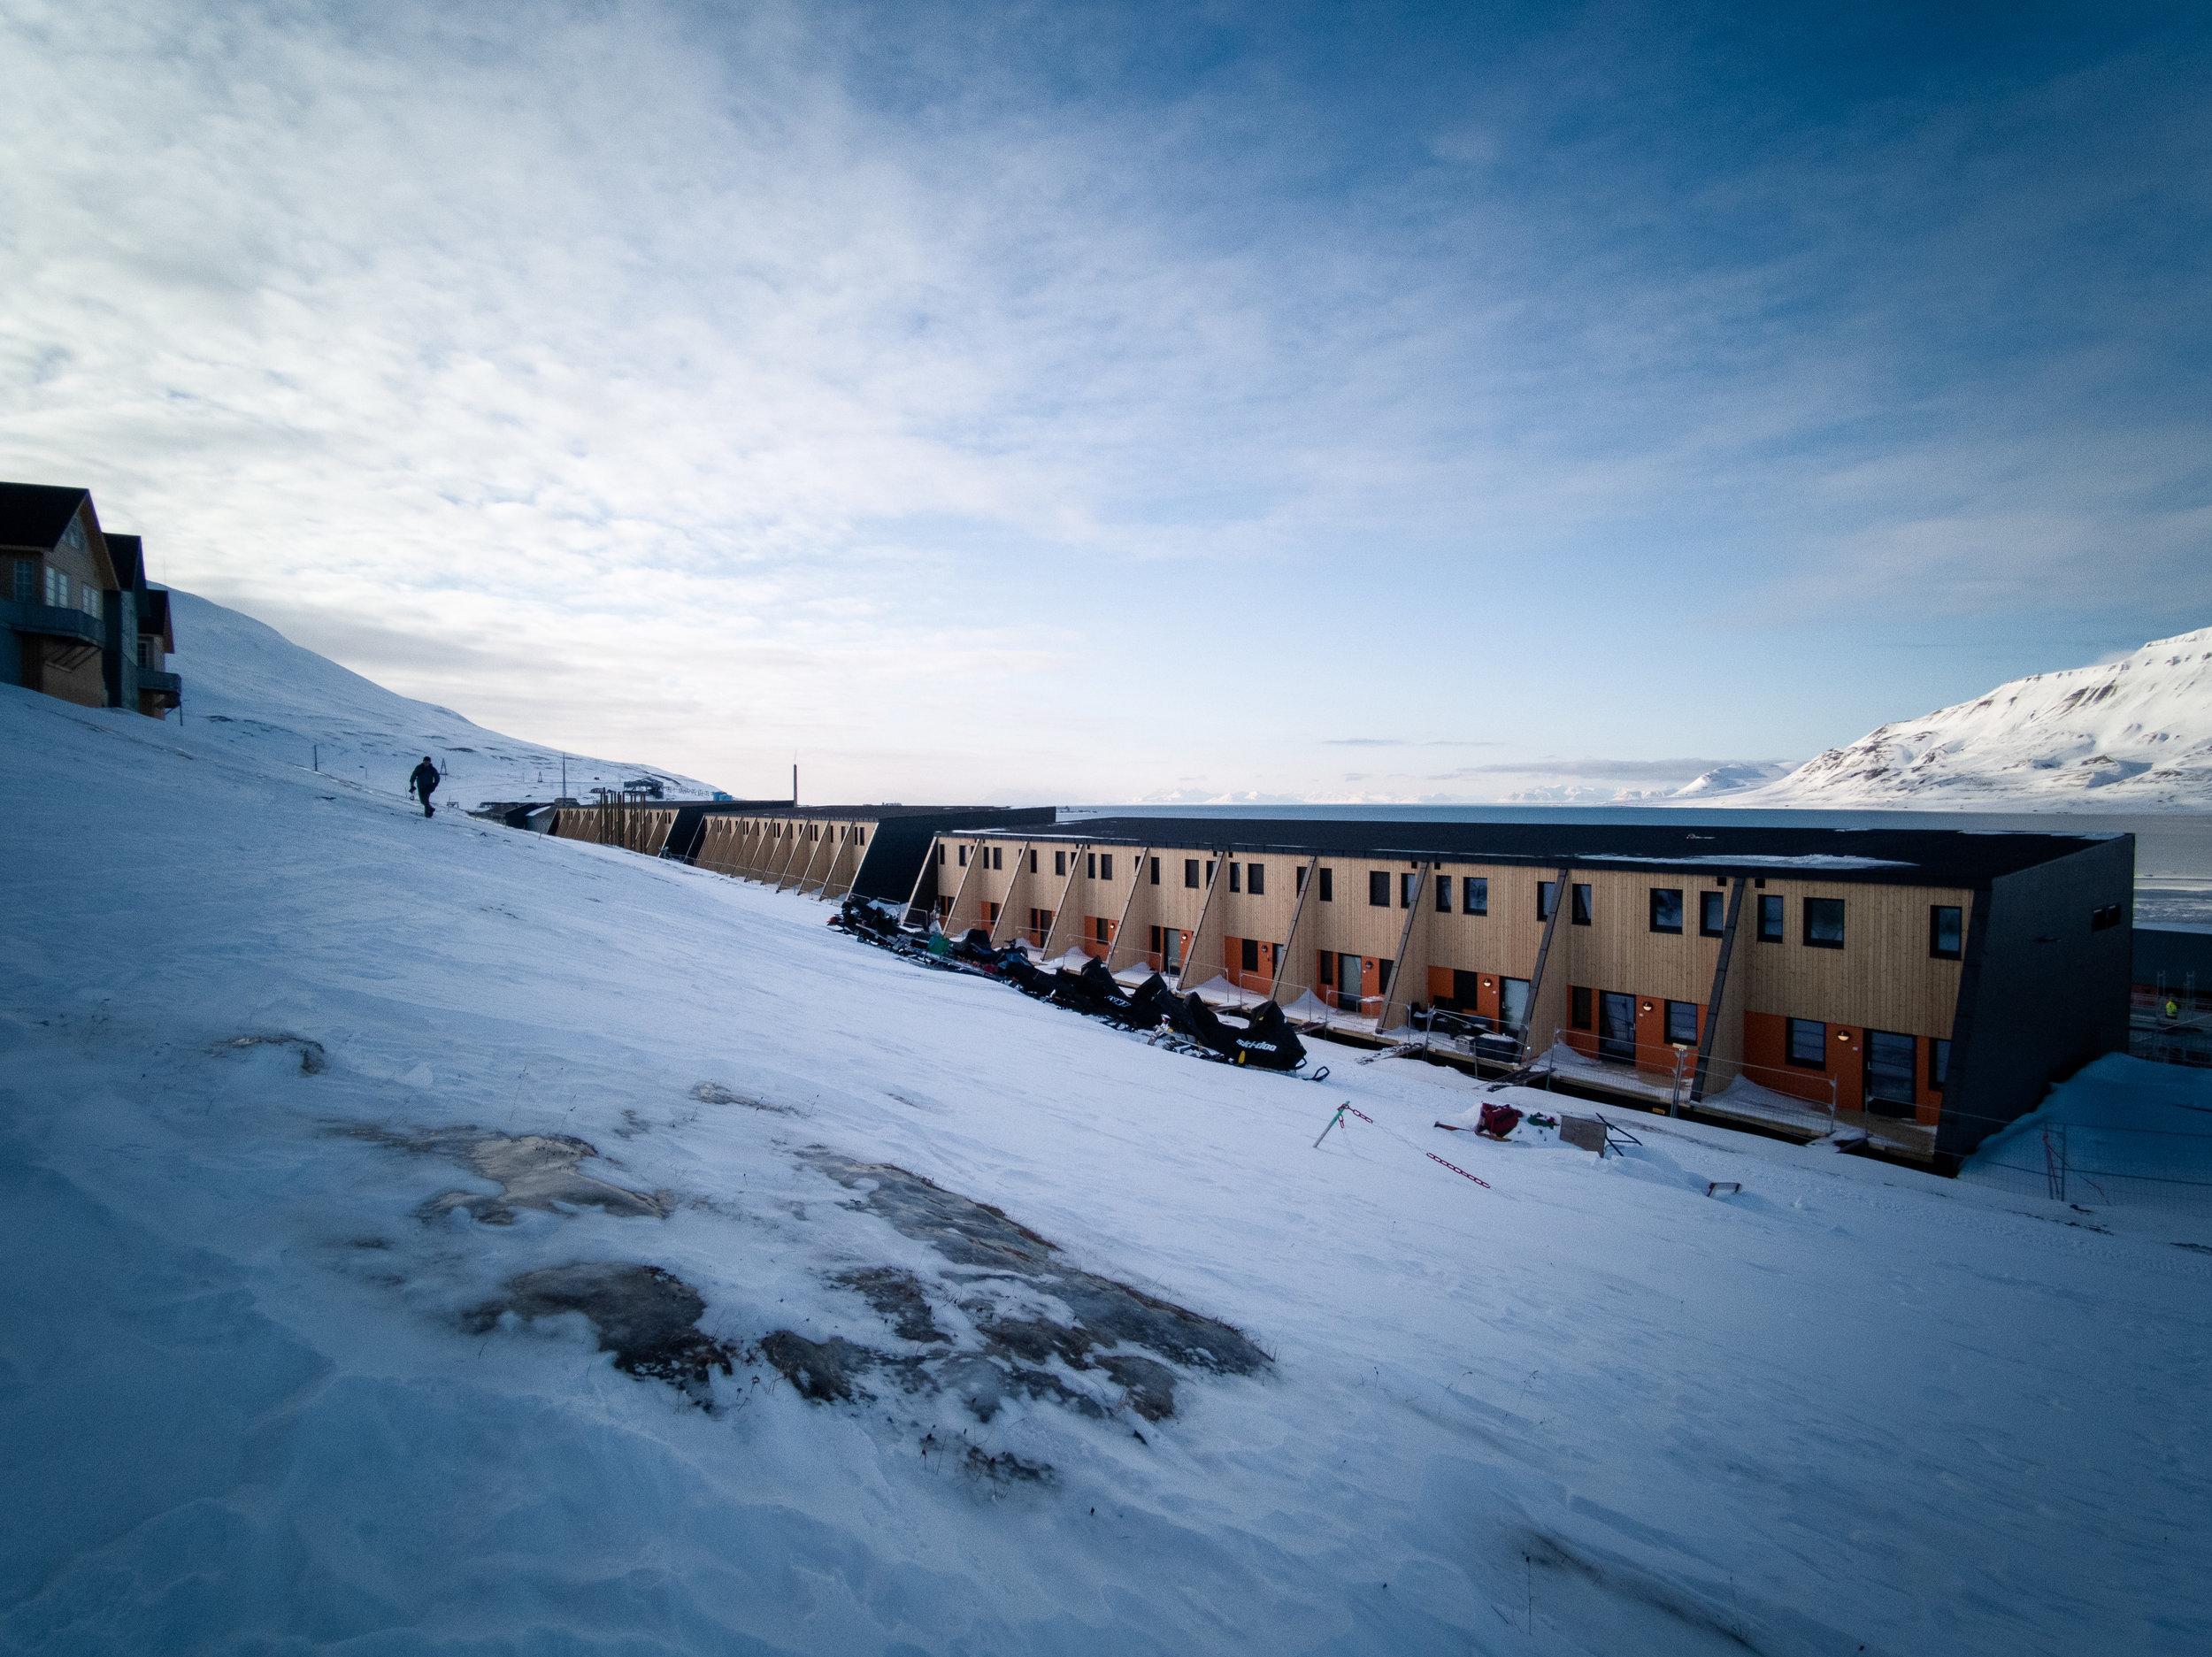 Boliger Longyearbyen, 2019